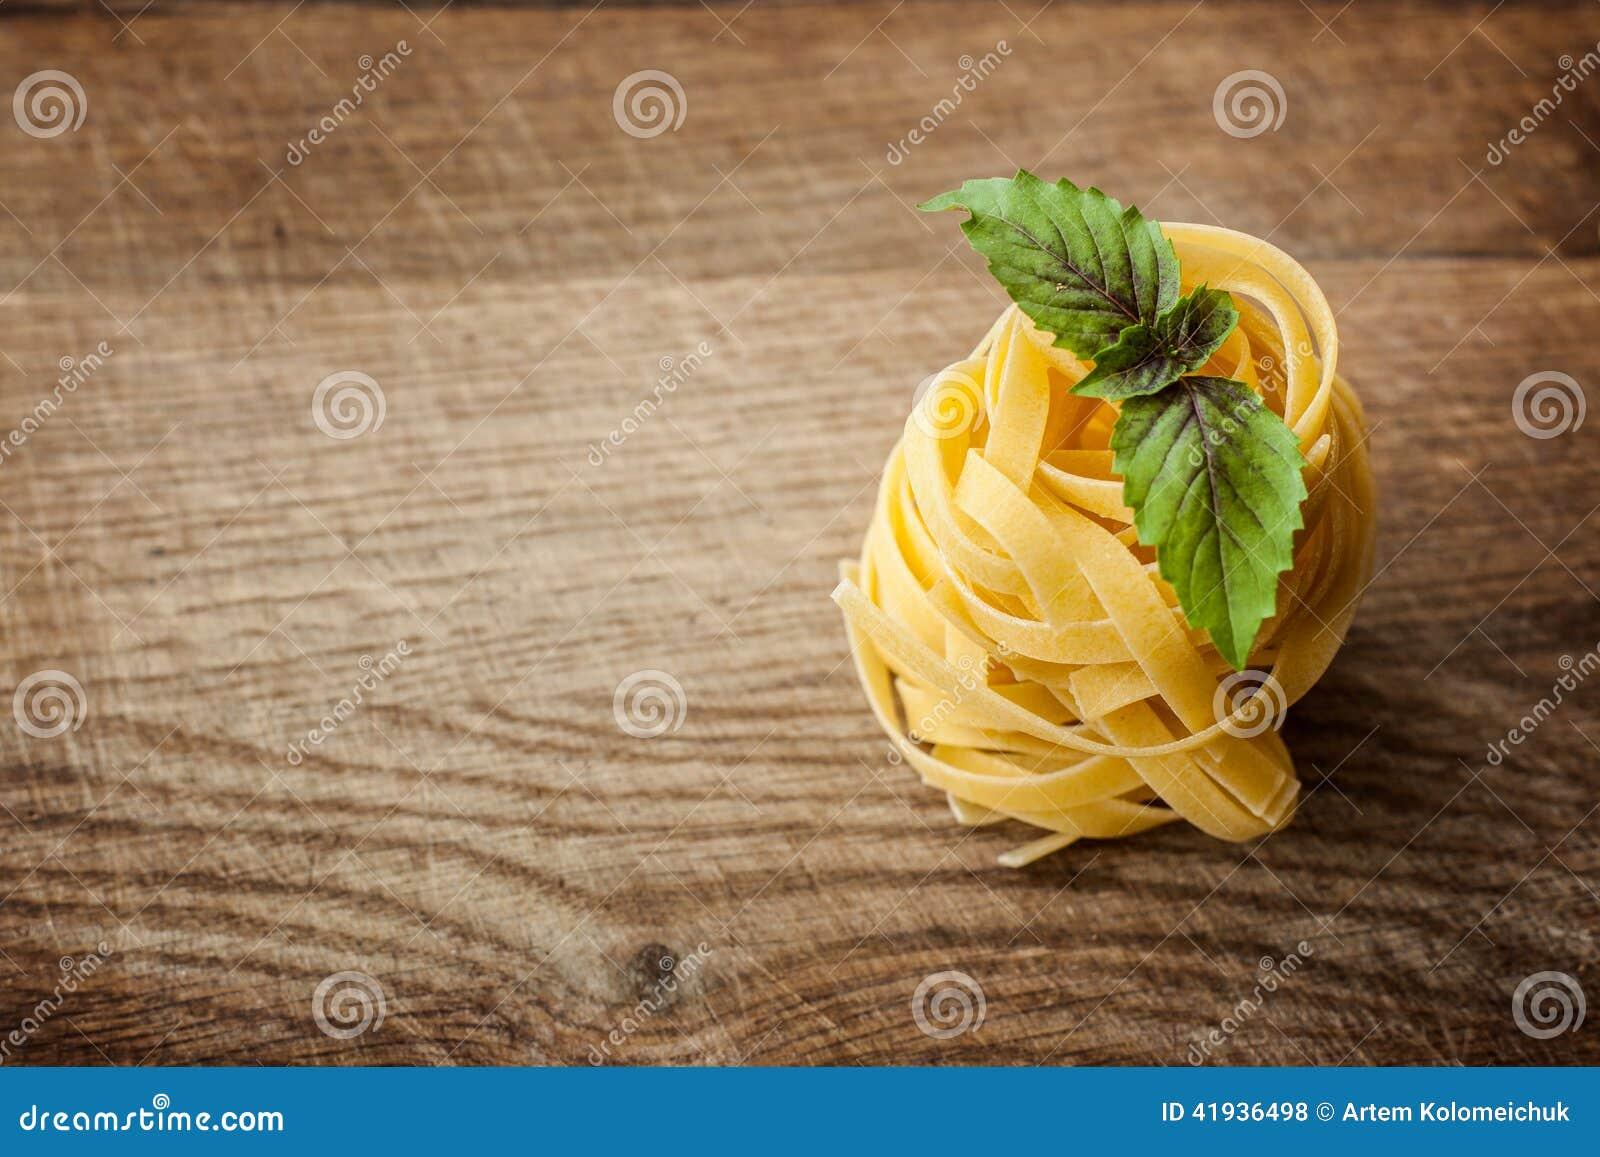 Pasta fresh basil on wood